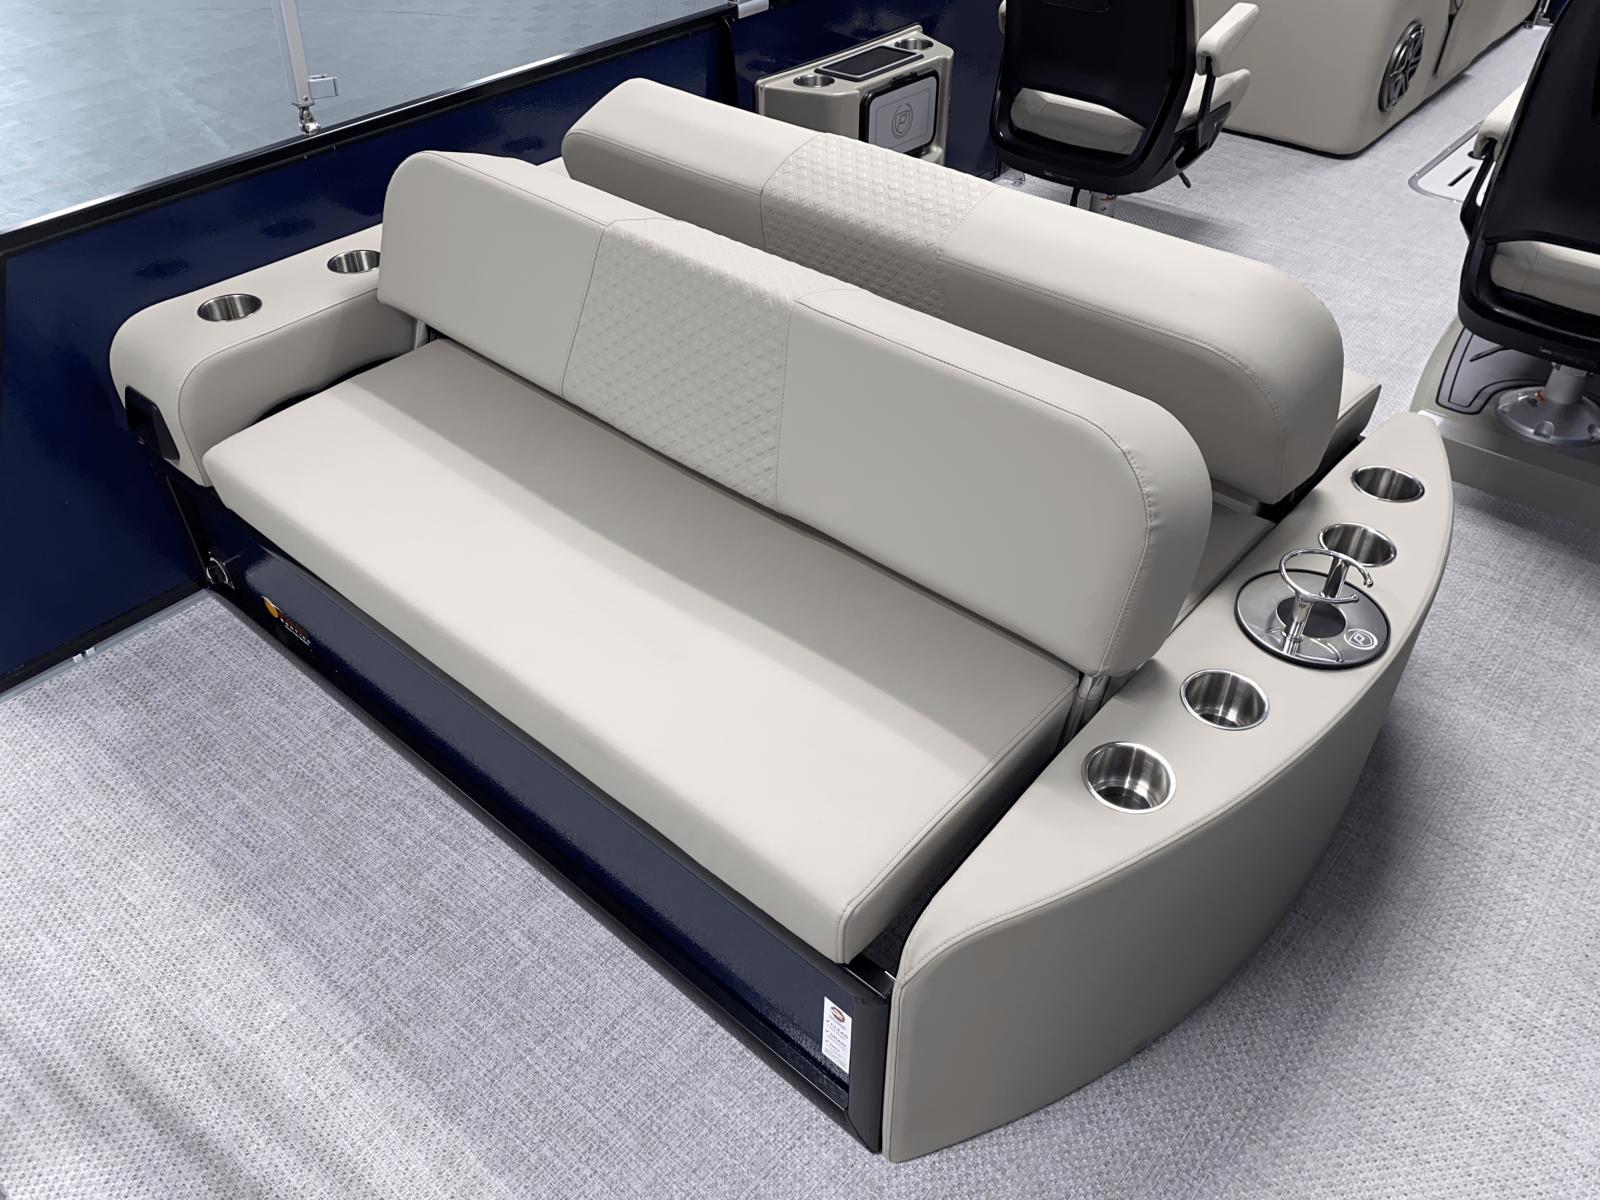 Rear Lounge of the 2022 Premier 230 Solaris RL Tritoon Boat